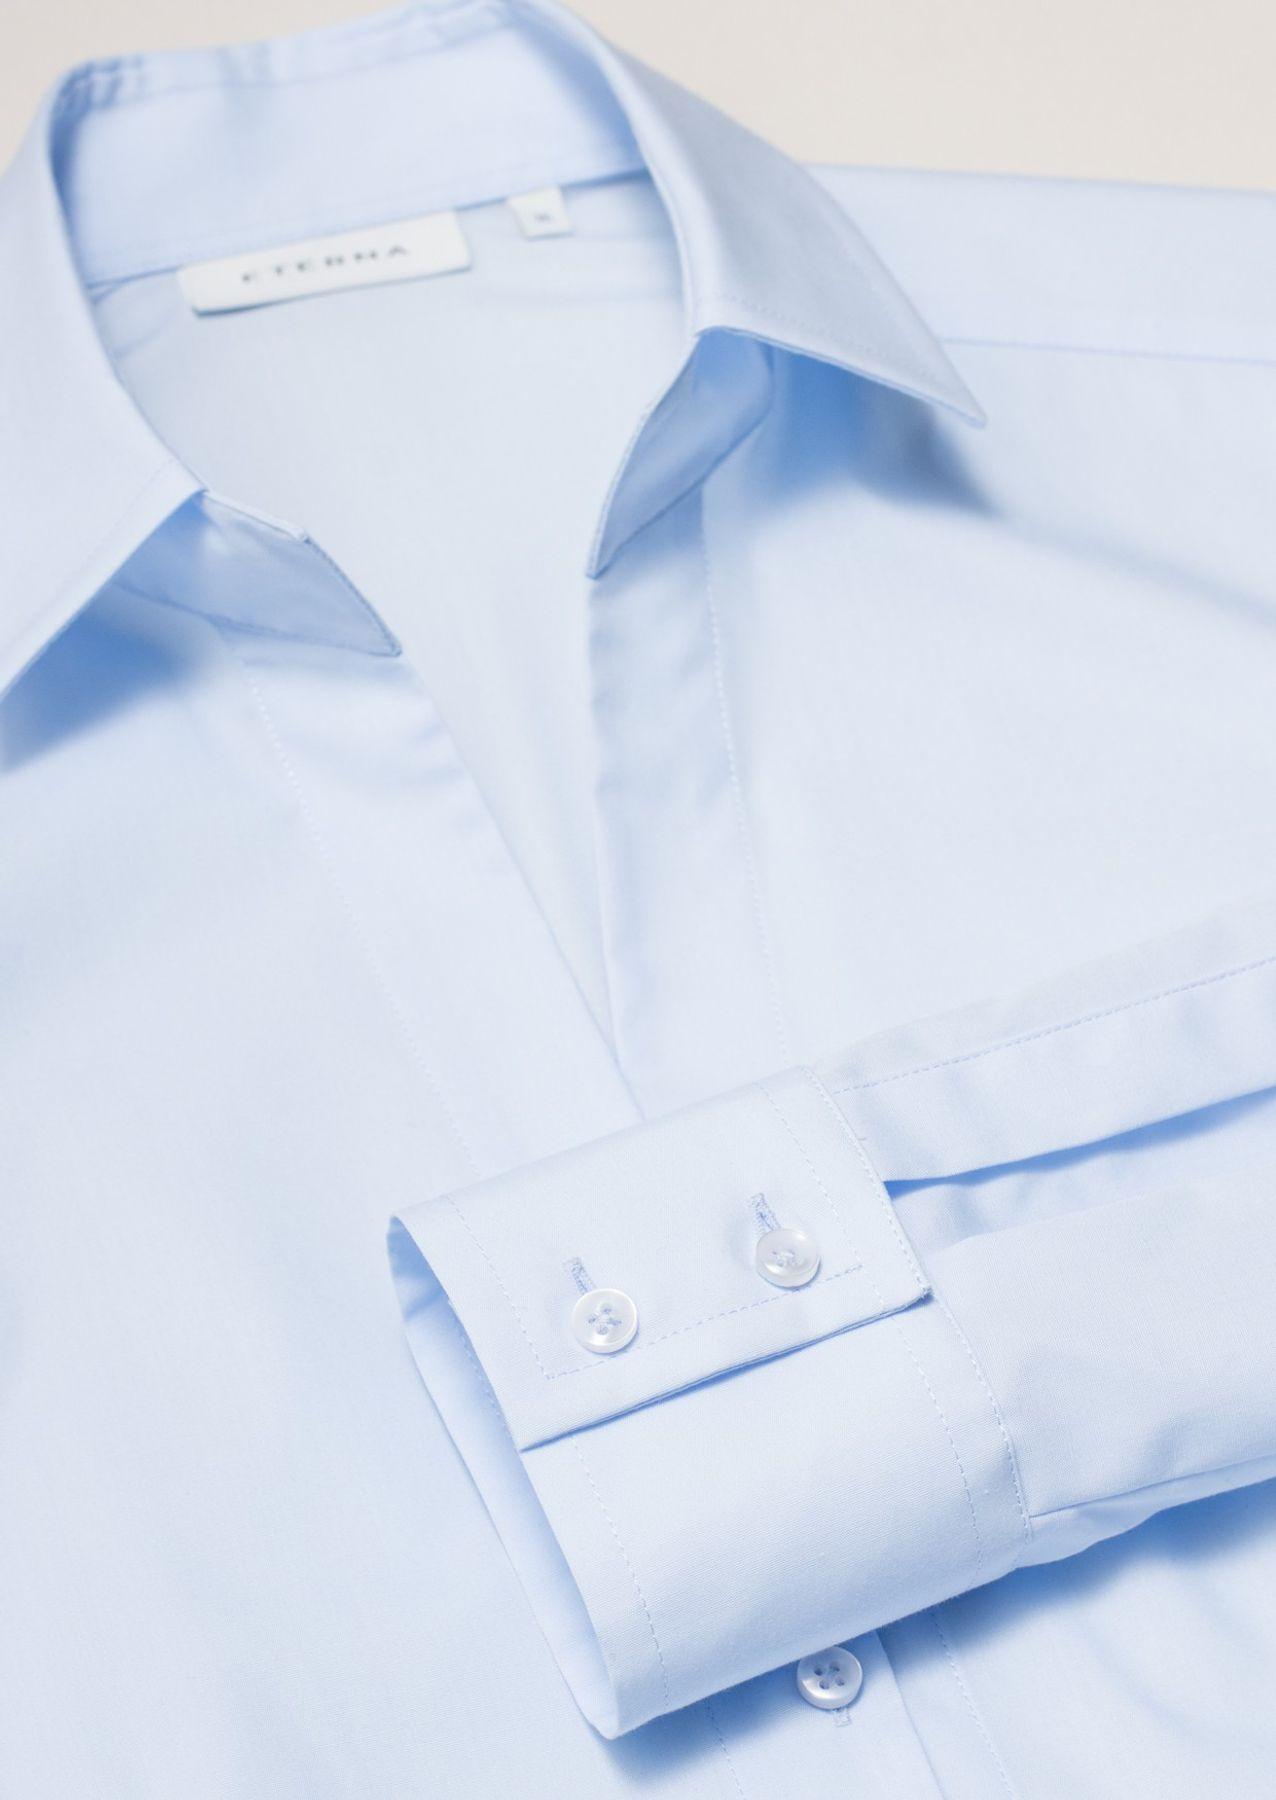 Eterna -  Comfort-Fit - Damen Langarm Bluse in Hellblau kariert  (5330 D661) – Bild 8